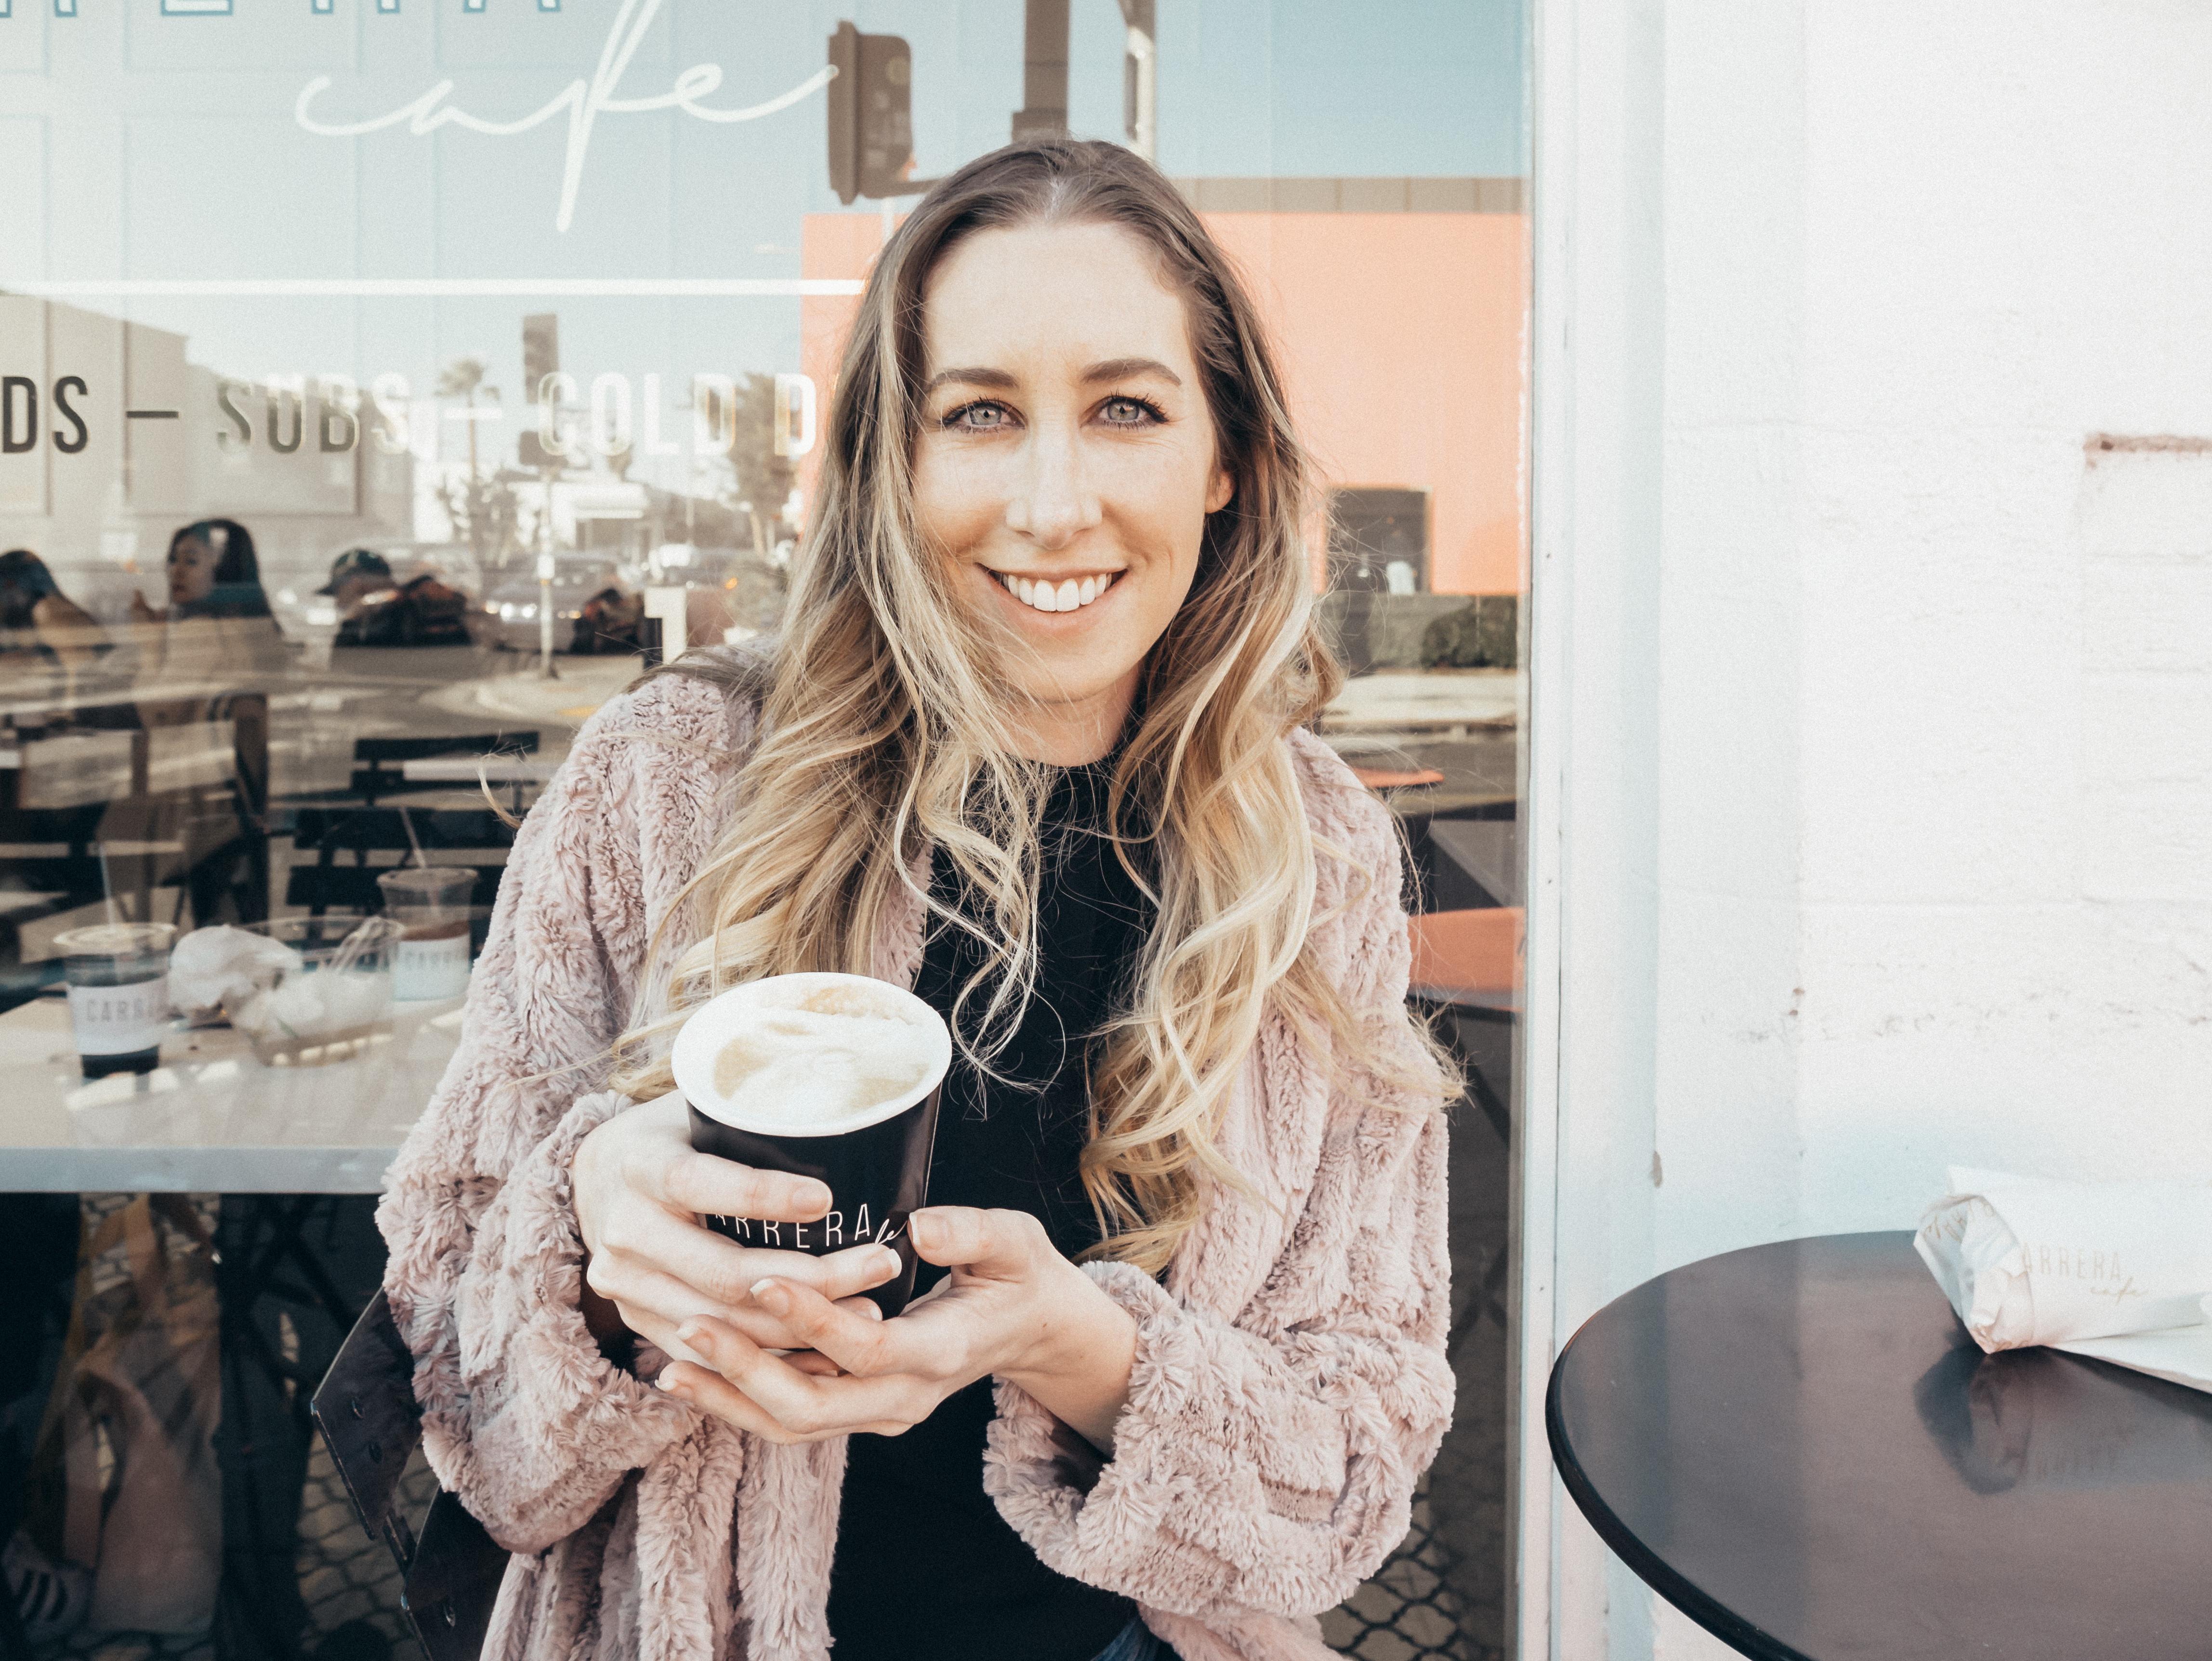 fun activities in Los Angeles: selfie coffee at Carrera Cafe